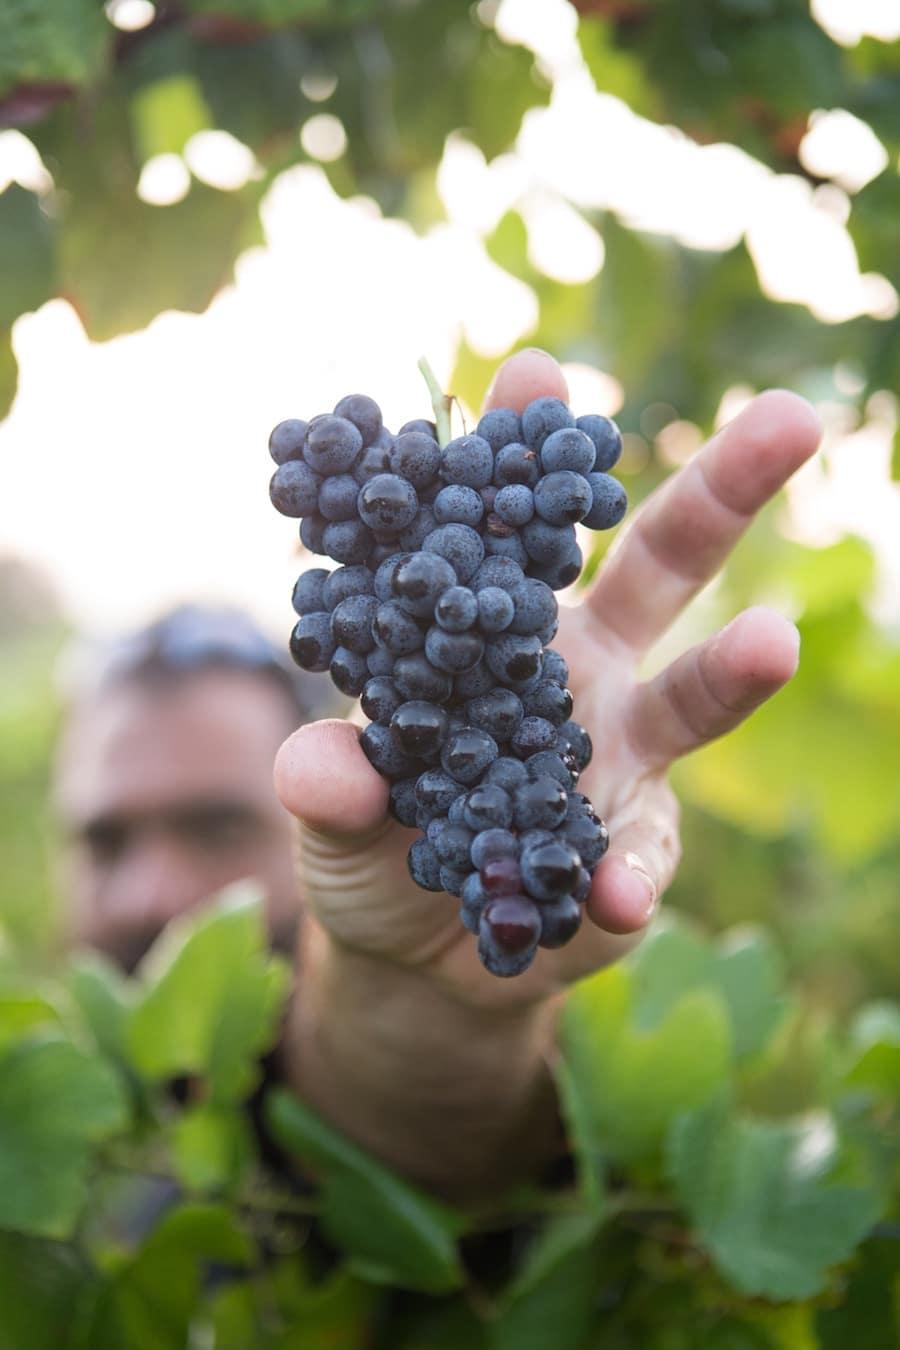 Entretenir son domaine viticole, mode d'emploi